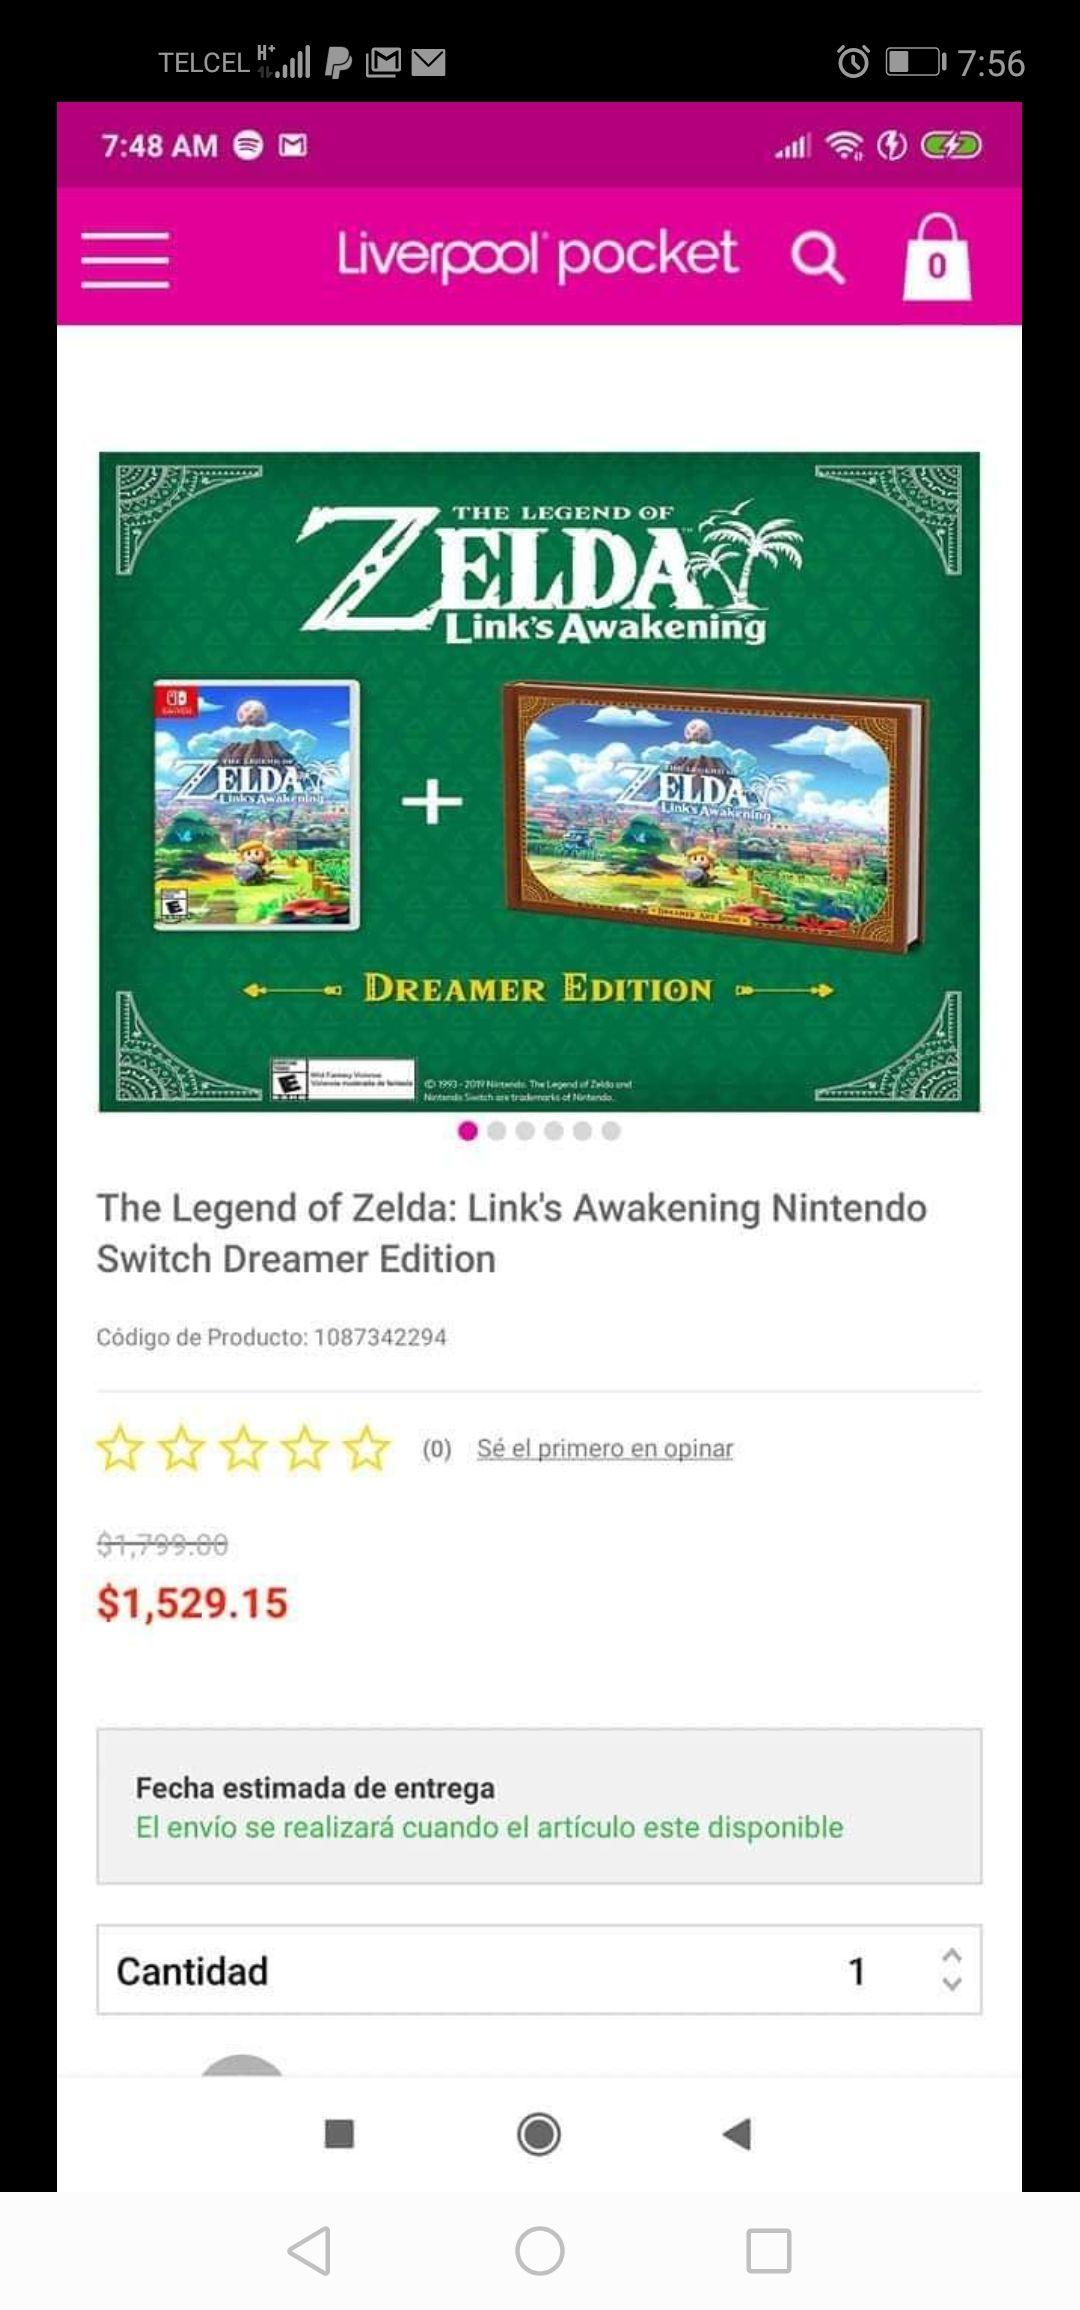 Liverpool: The Legend of Zelda: Link's Awakening Nintendo Switch Dreamer Edition